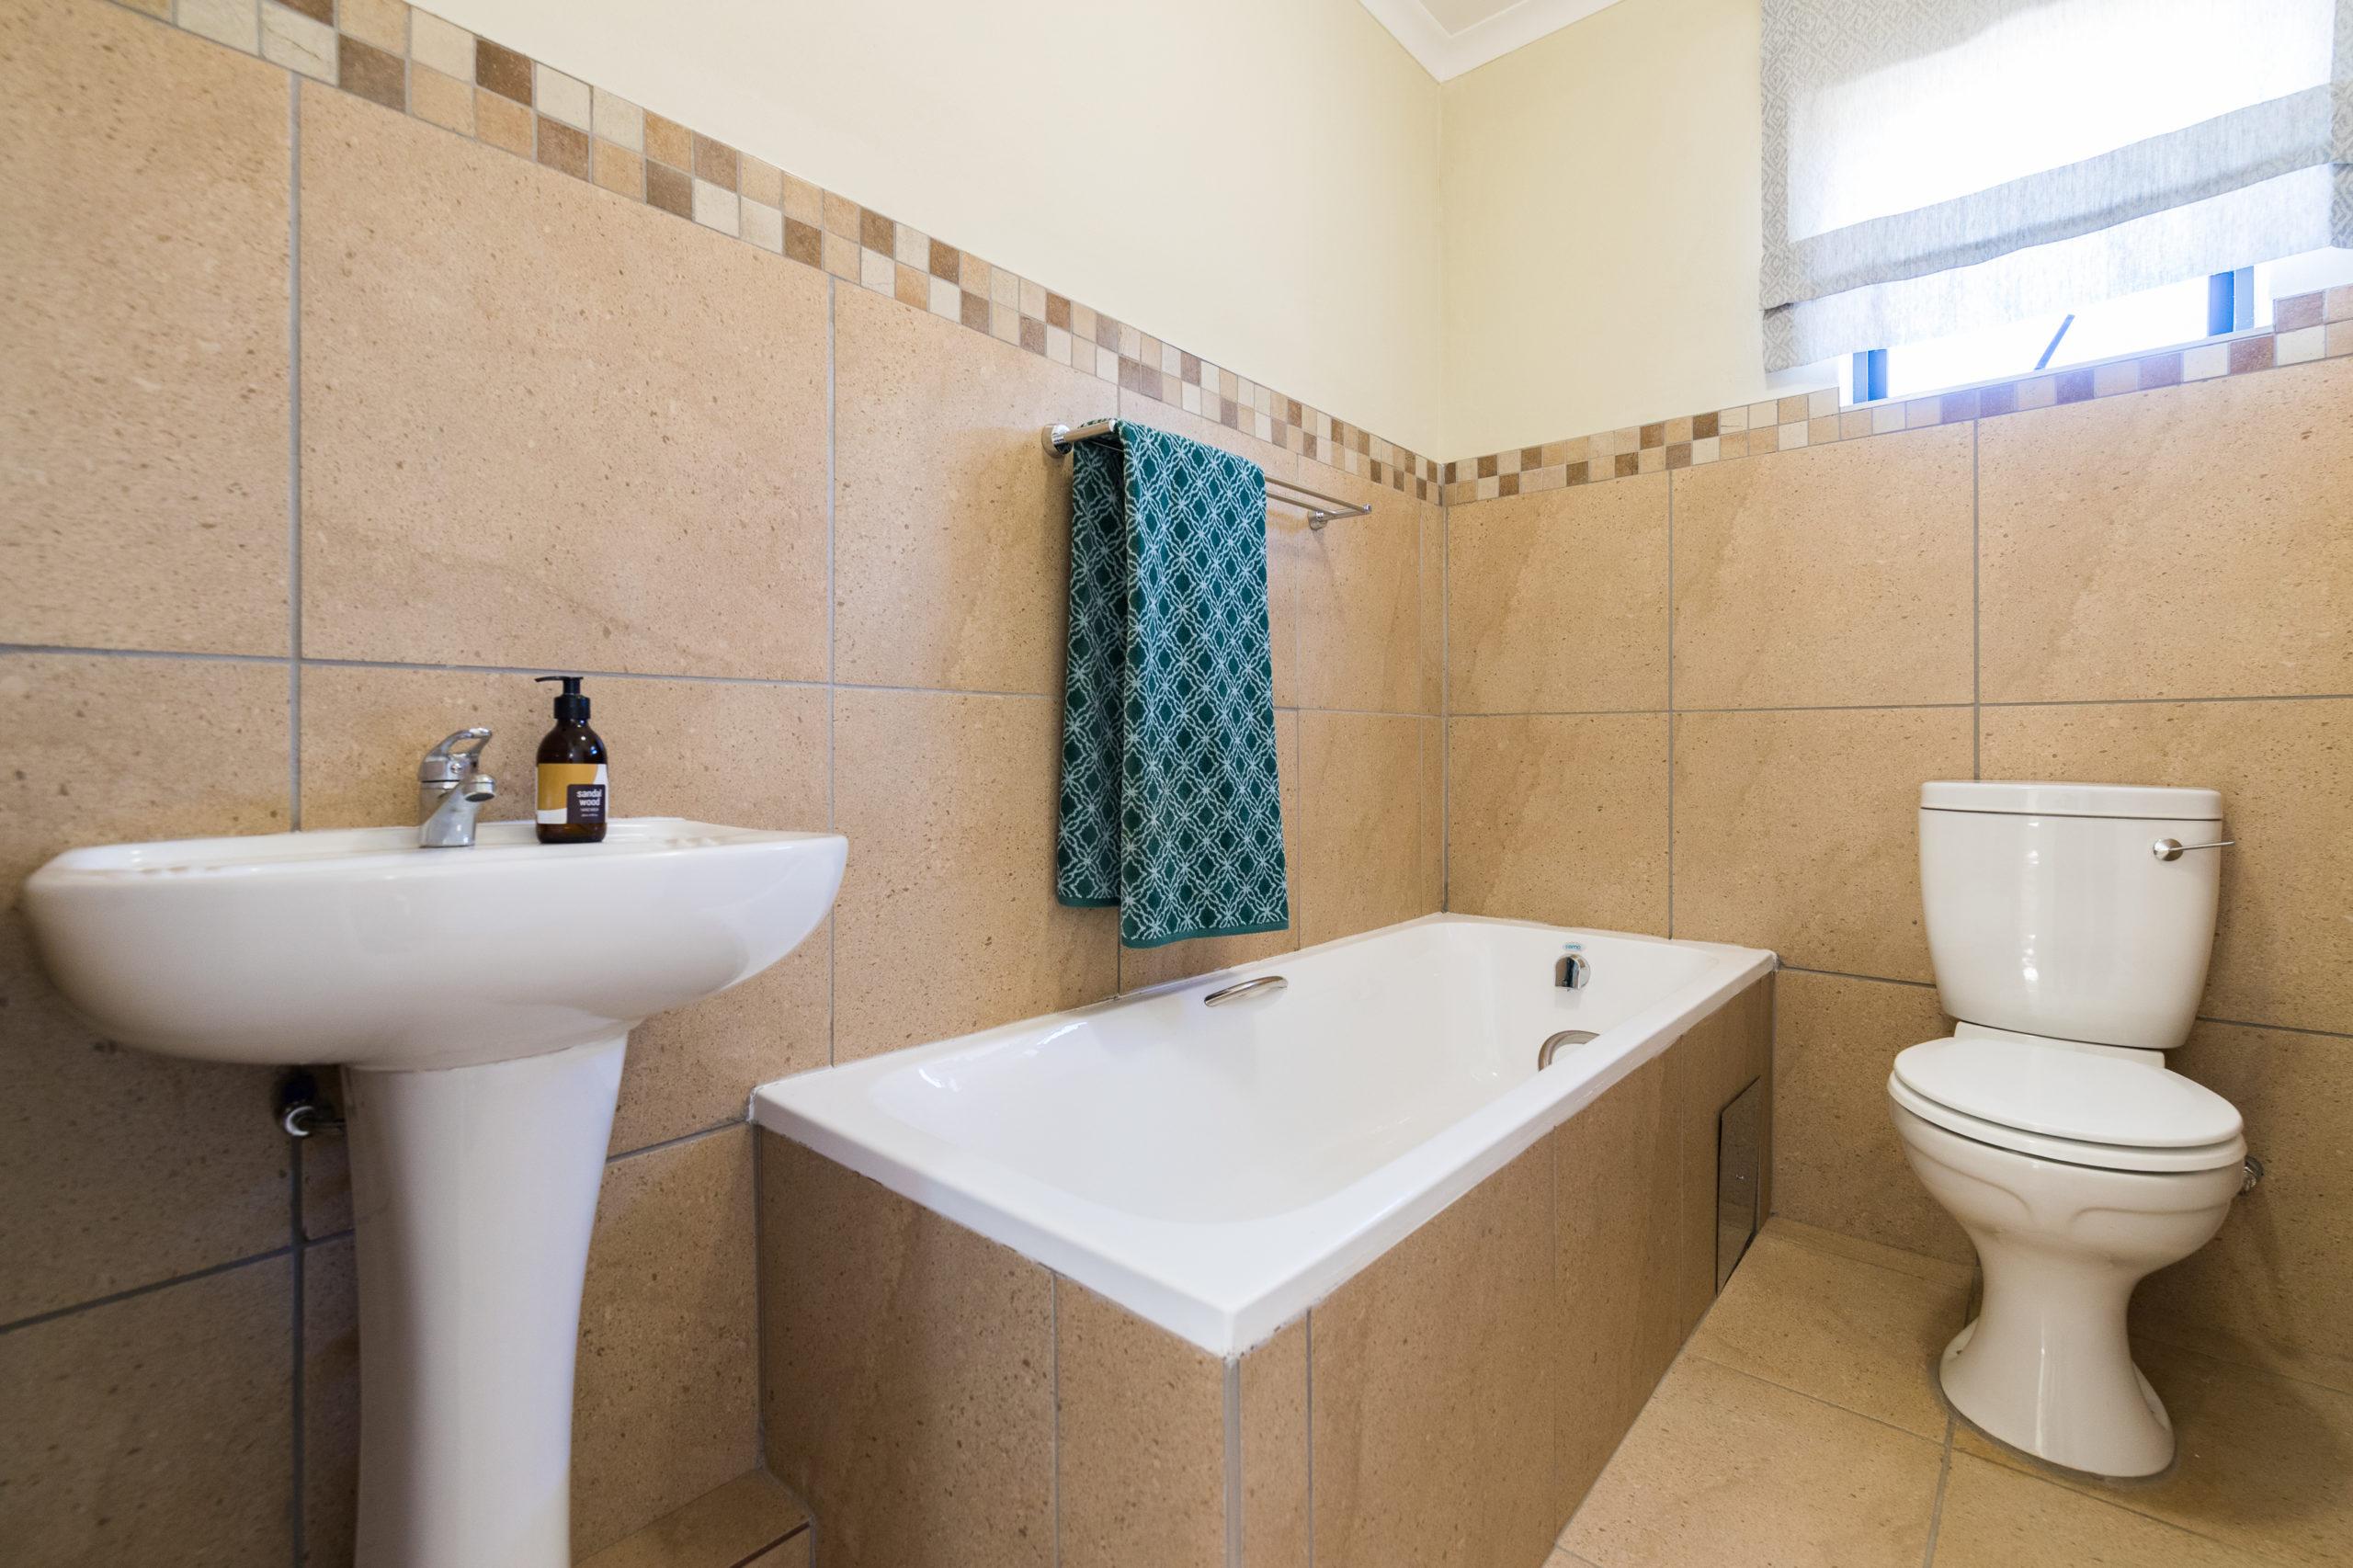 Royal Cradle, Homes for Sale in Mindalore, Gauteng - Bathroom